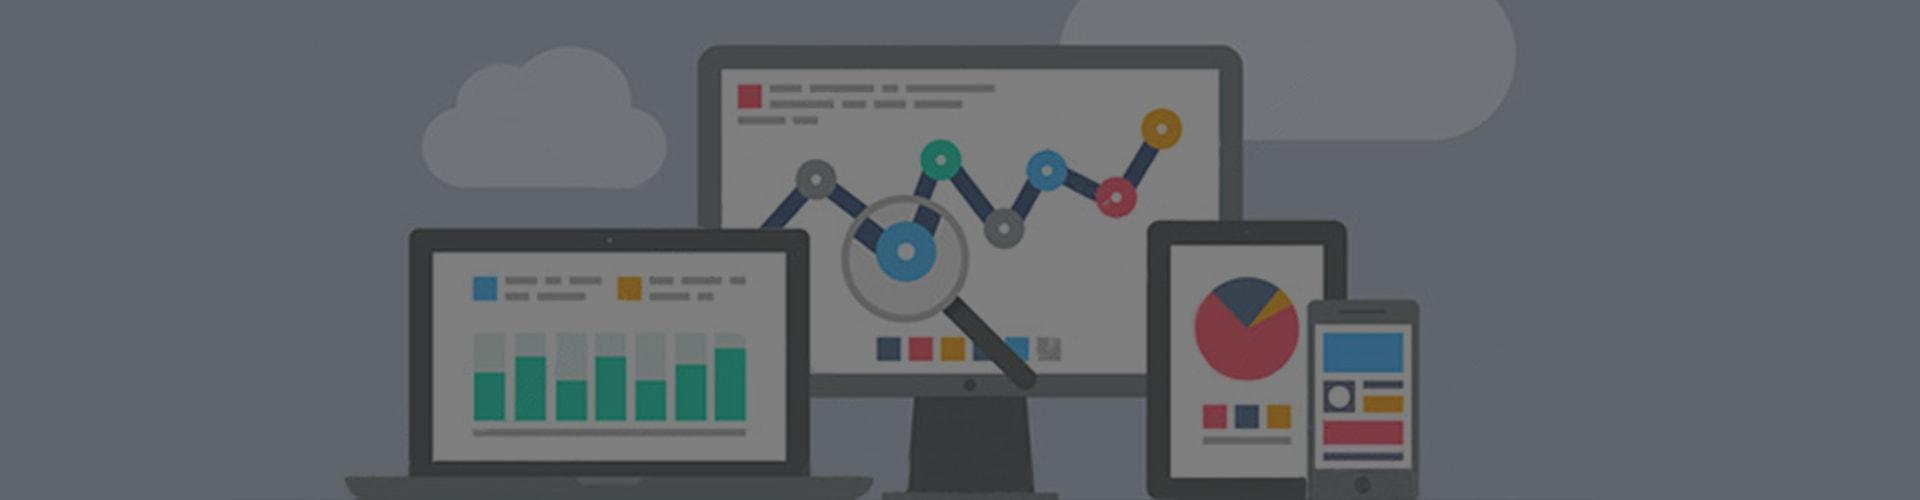 Автоматизация бизнеса CRM